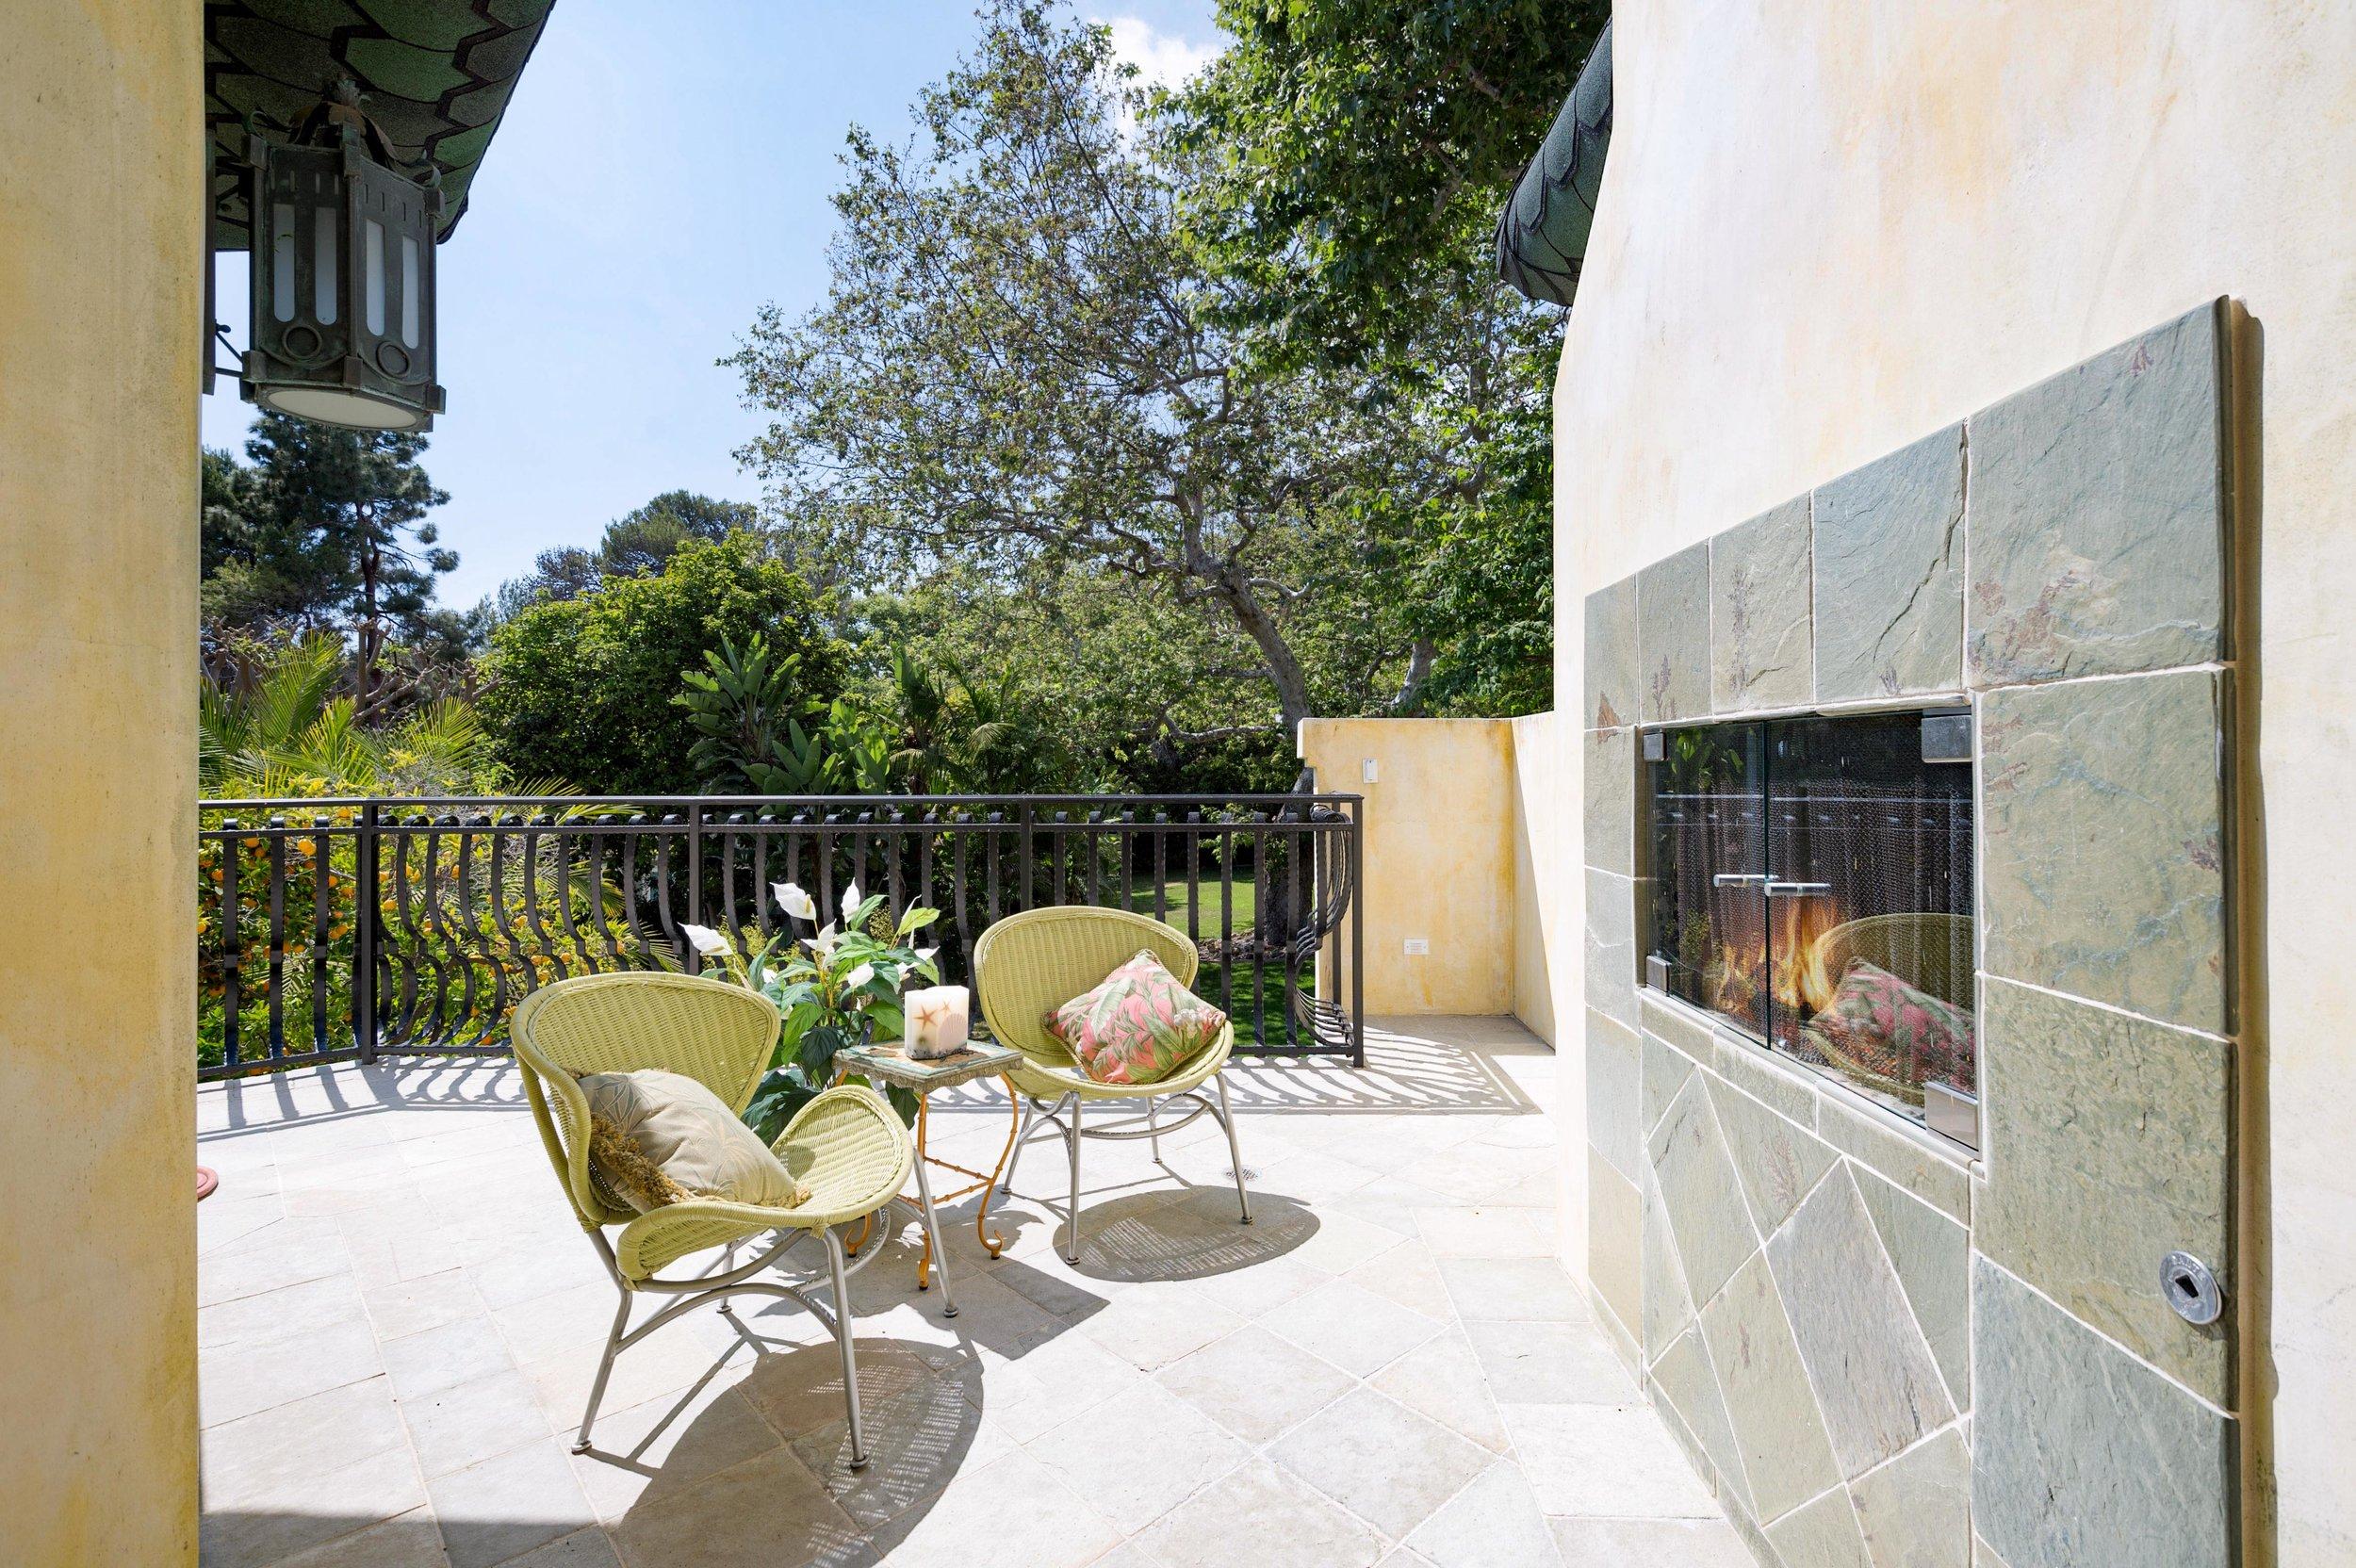 016.5 master balcony 6405 bonsall Malibu For Sale The Malibu Life Team Luxury Real Estate.jpg